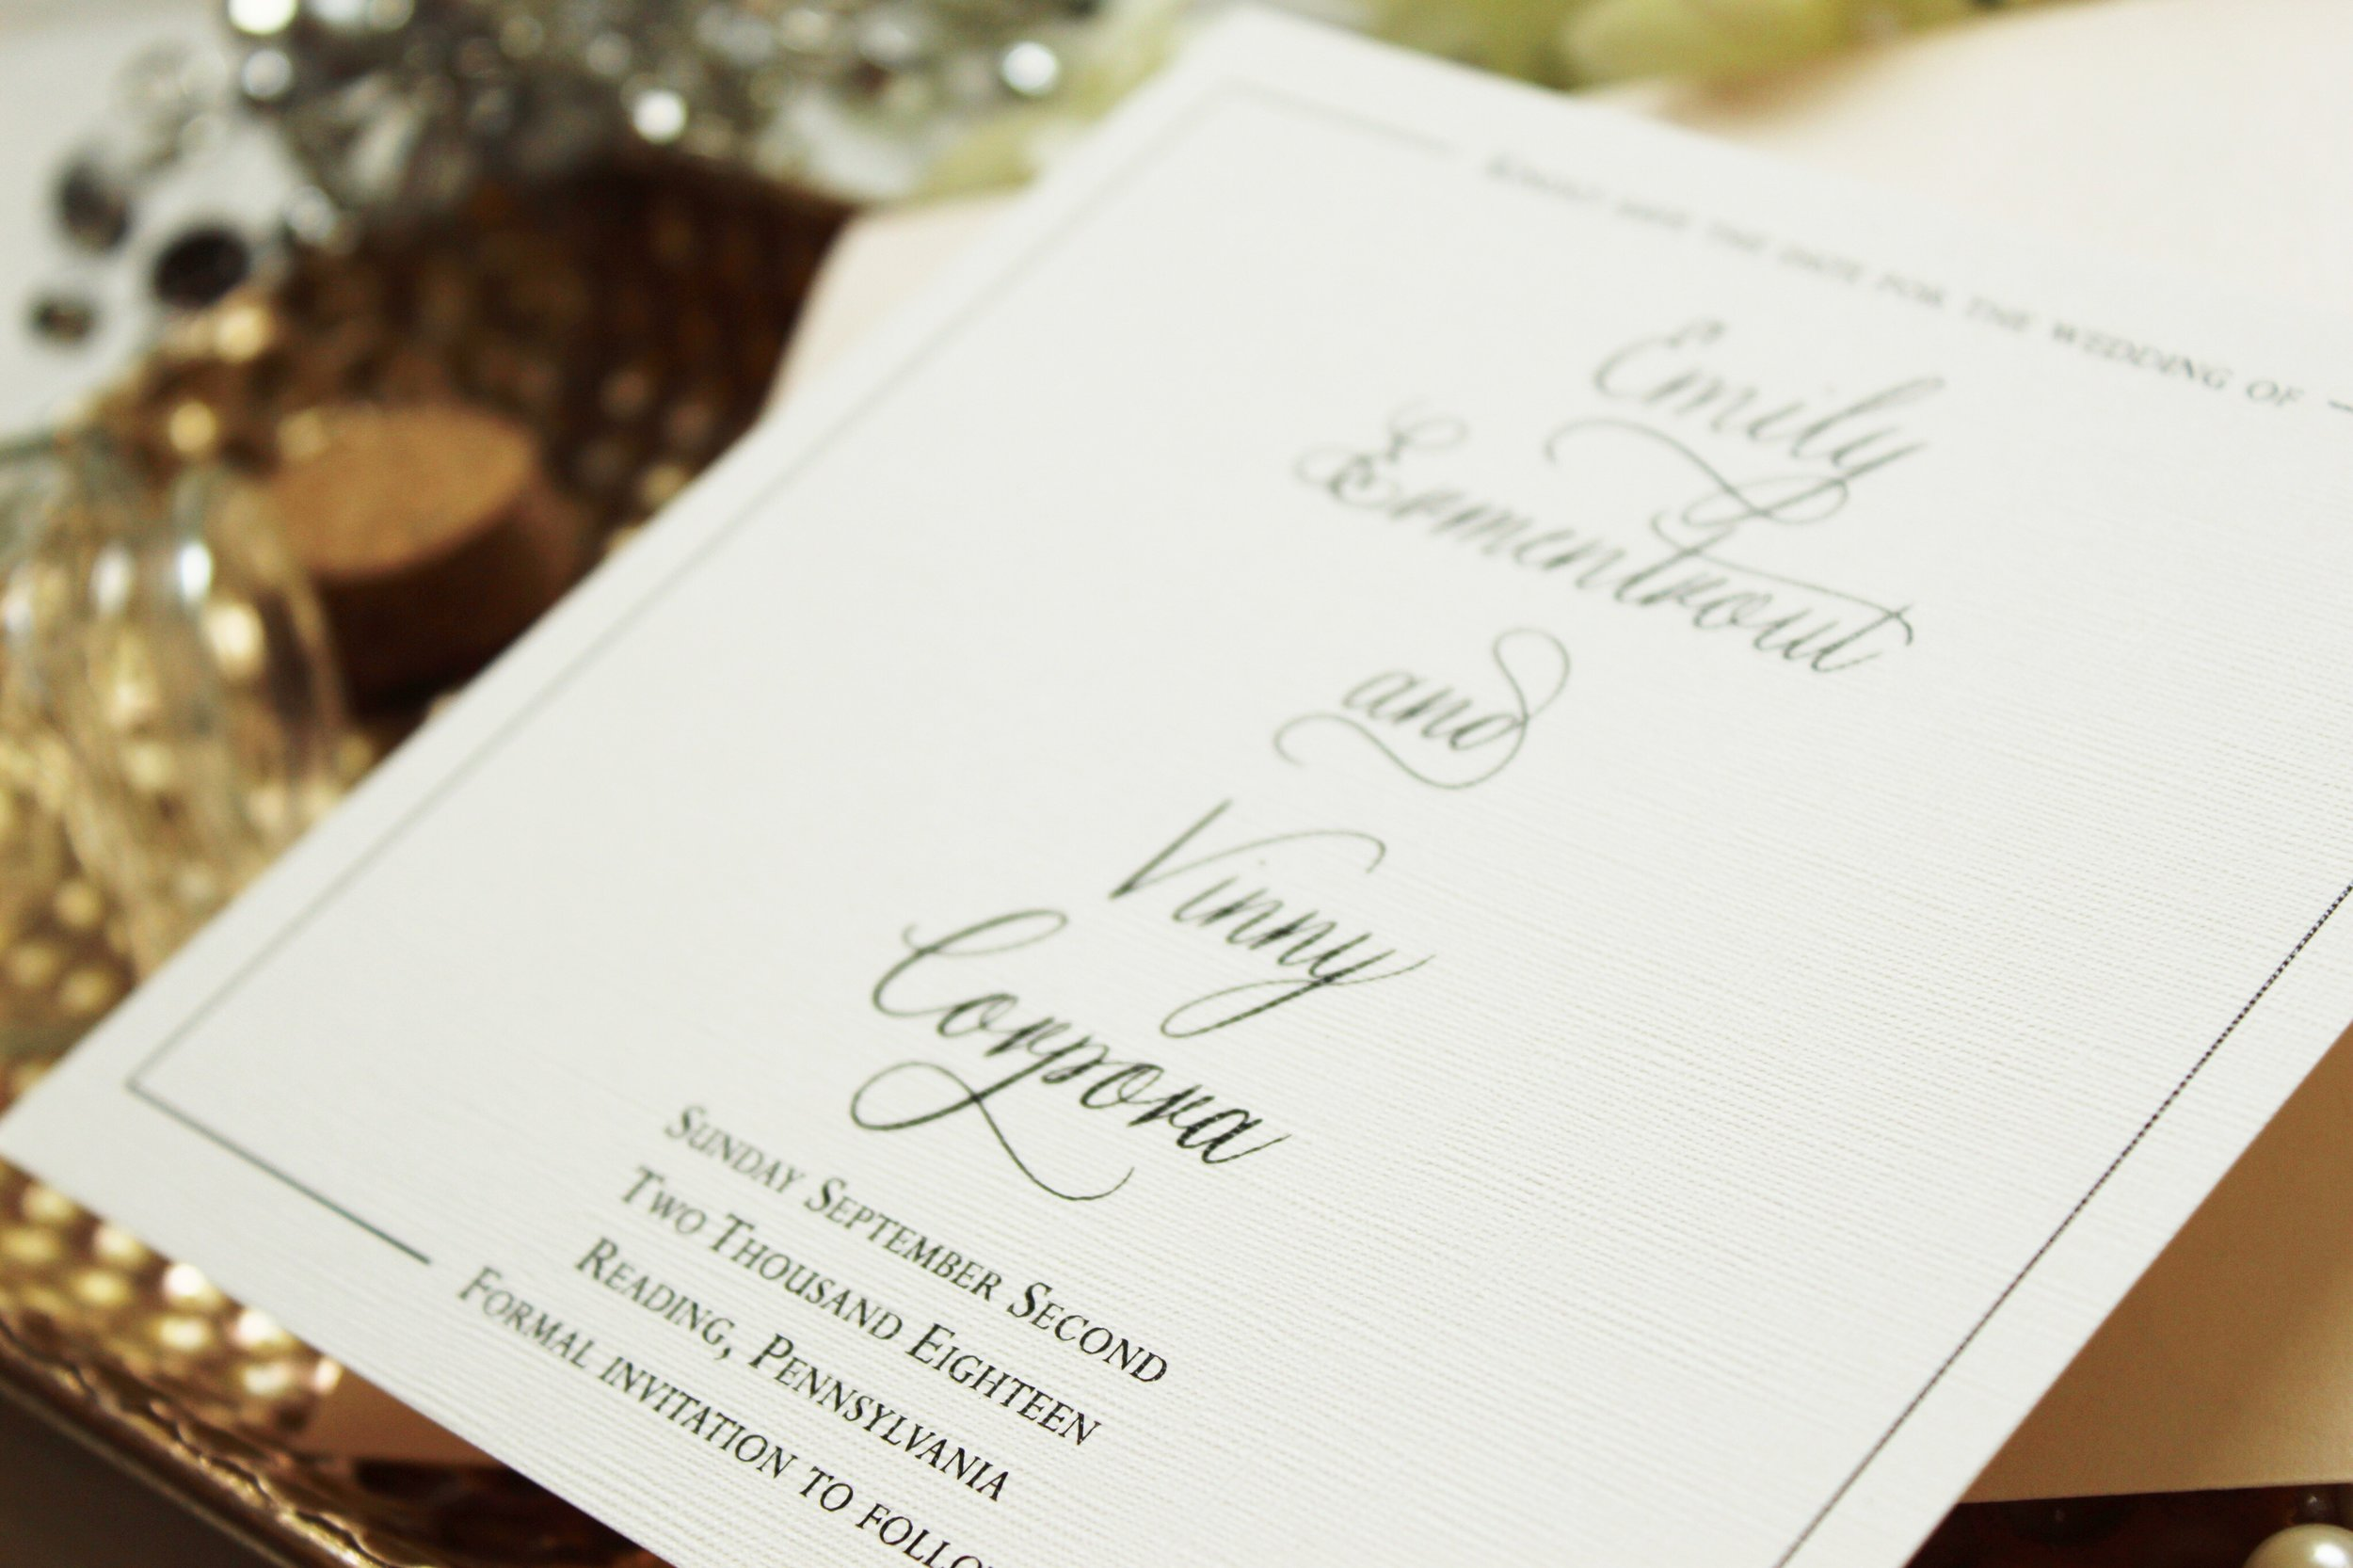 Central PA, York PA, JesSmith Designs, custom, wedding, invitations, bridal, announcements, save the date, baby, hanover, calligraphy, baltimore, wedding invitations, lancaster, gettysburg-05-10 17.08.52.jpg